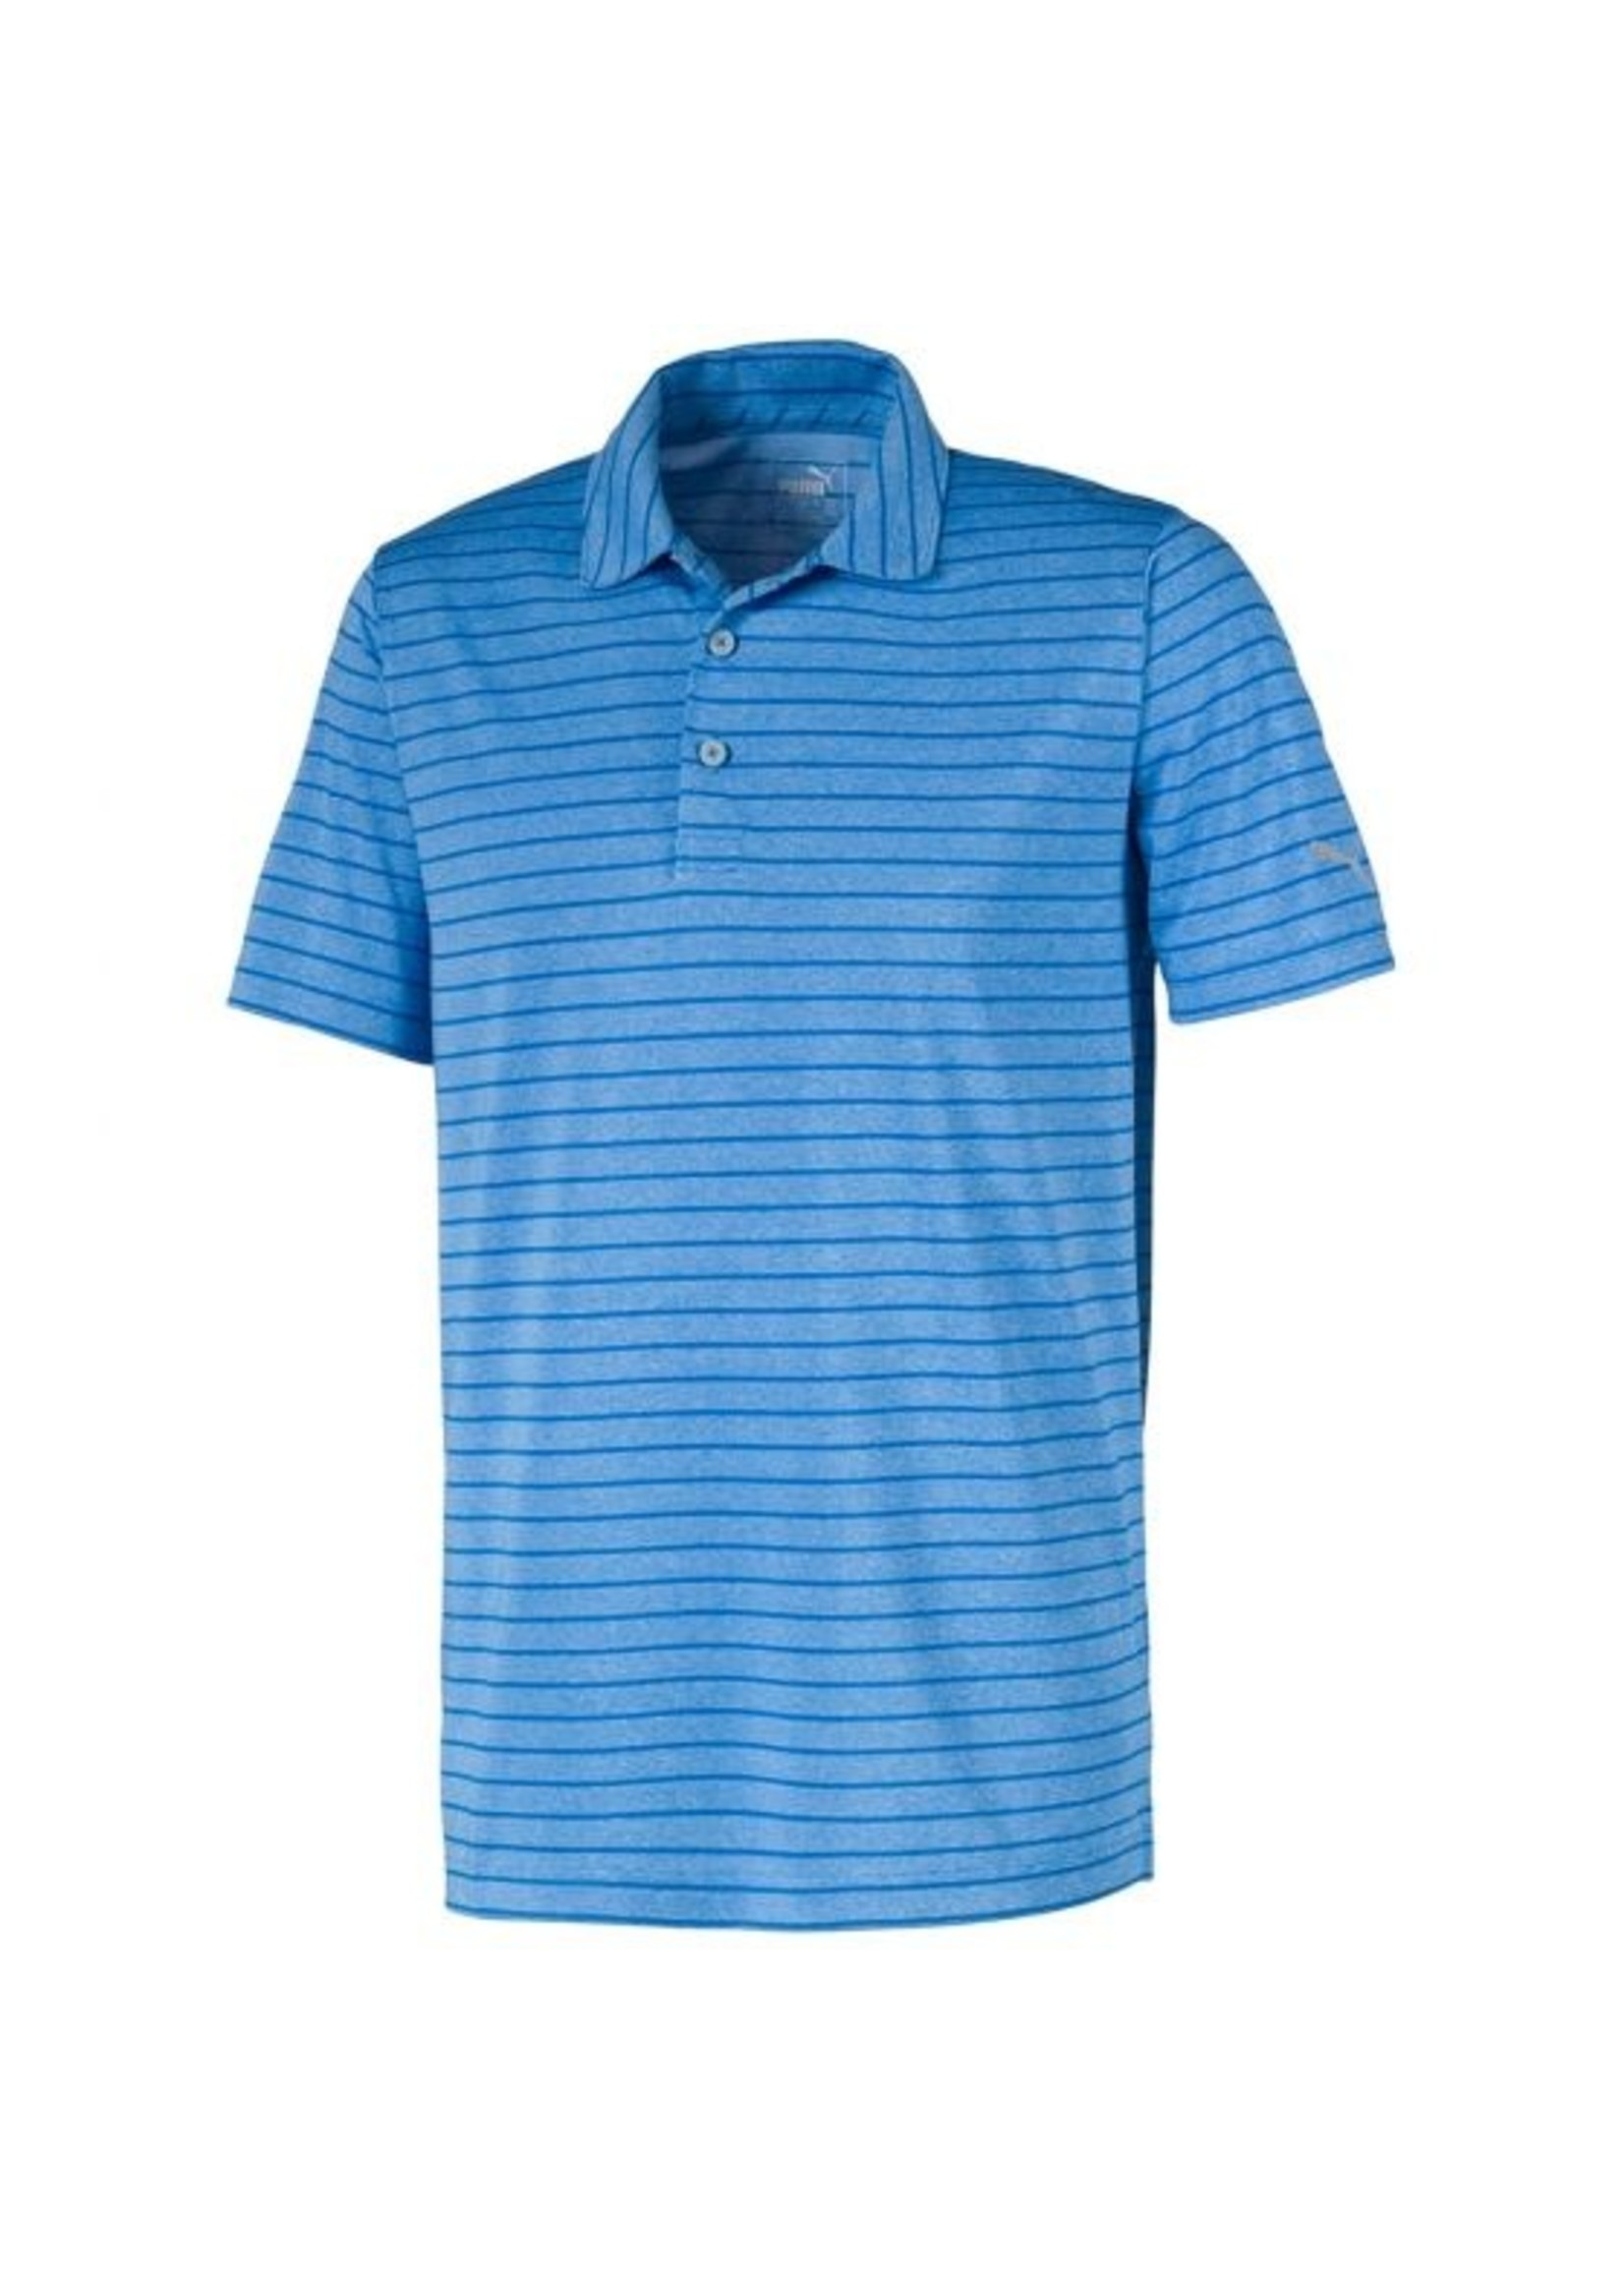 PUMA KINGSWELL GLEN Rotation Stripe Golf Shirt Mens